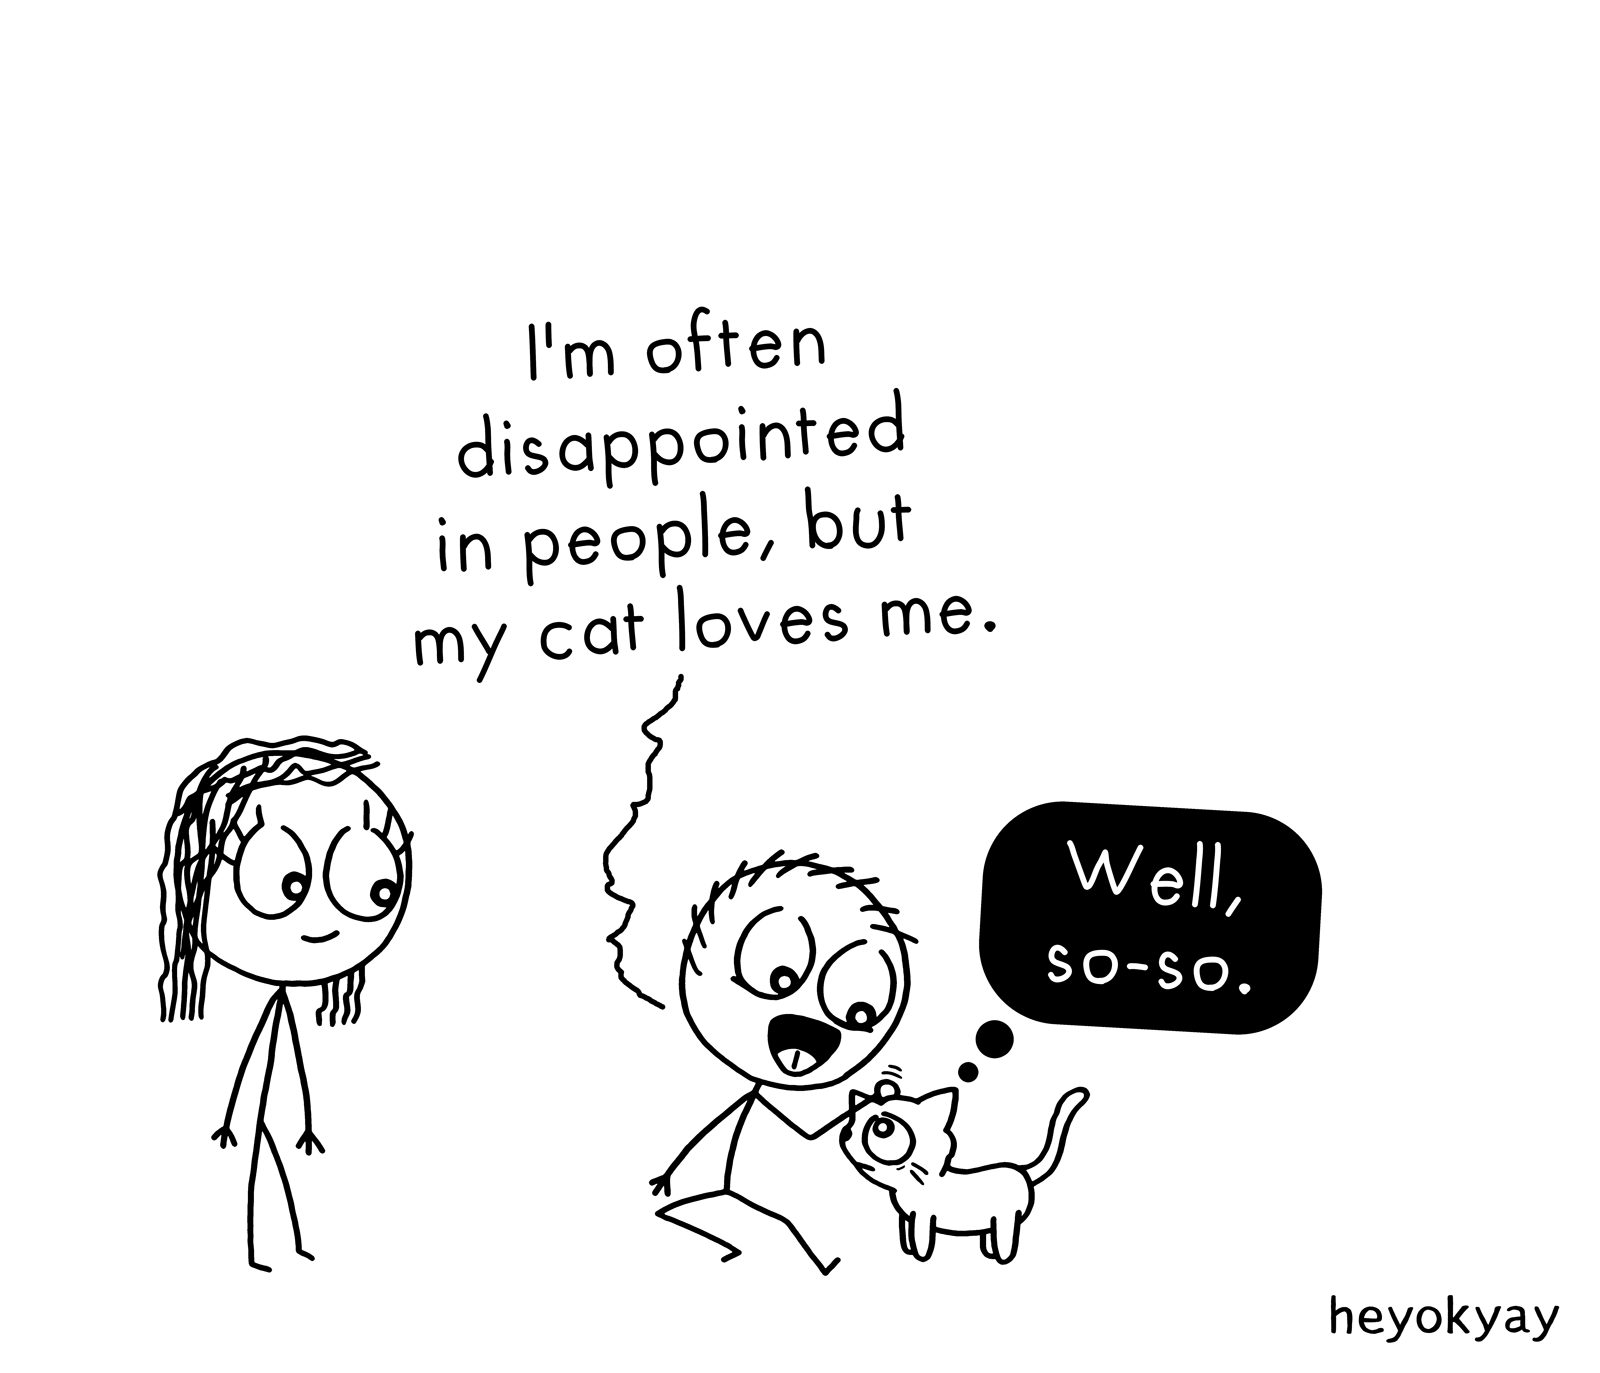 Cat Love heyokyay comic